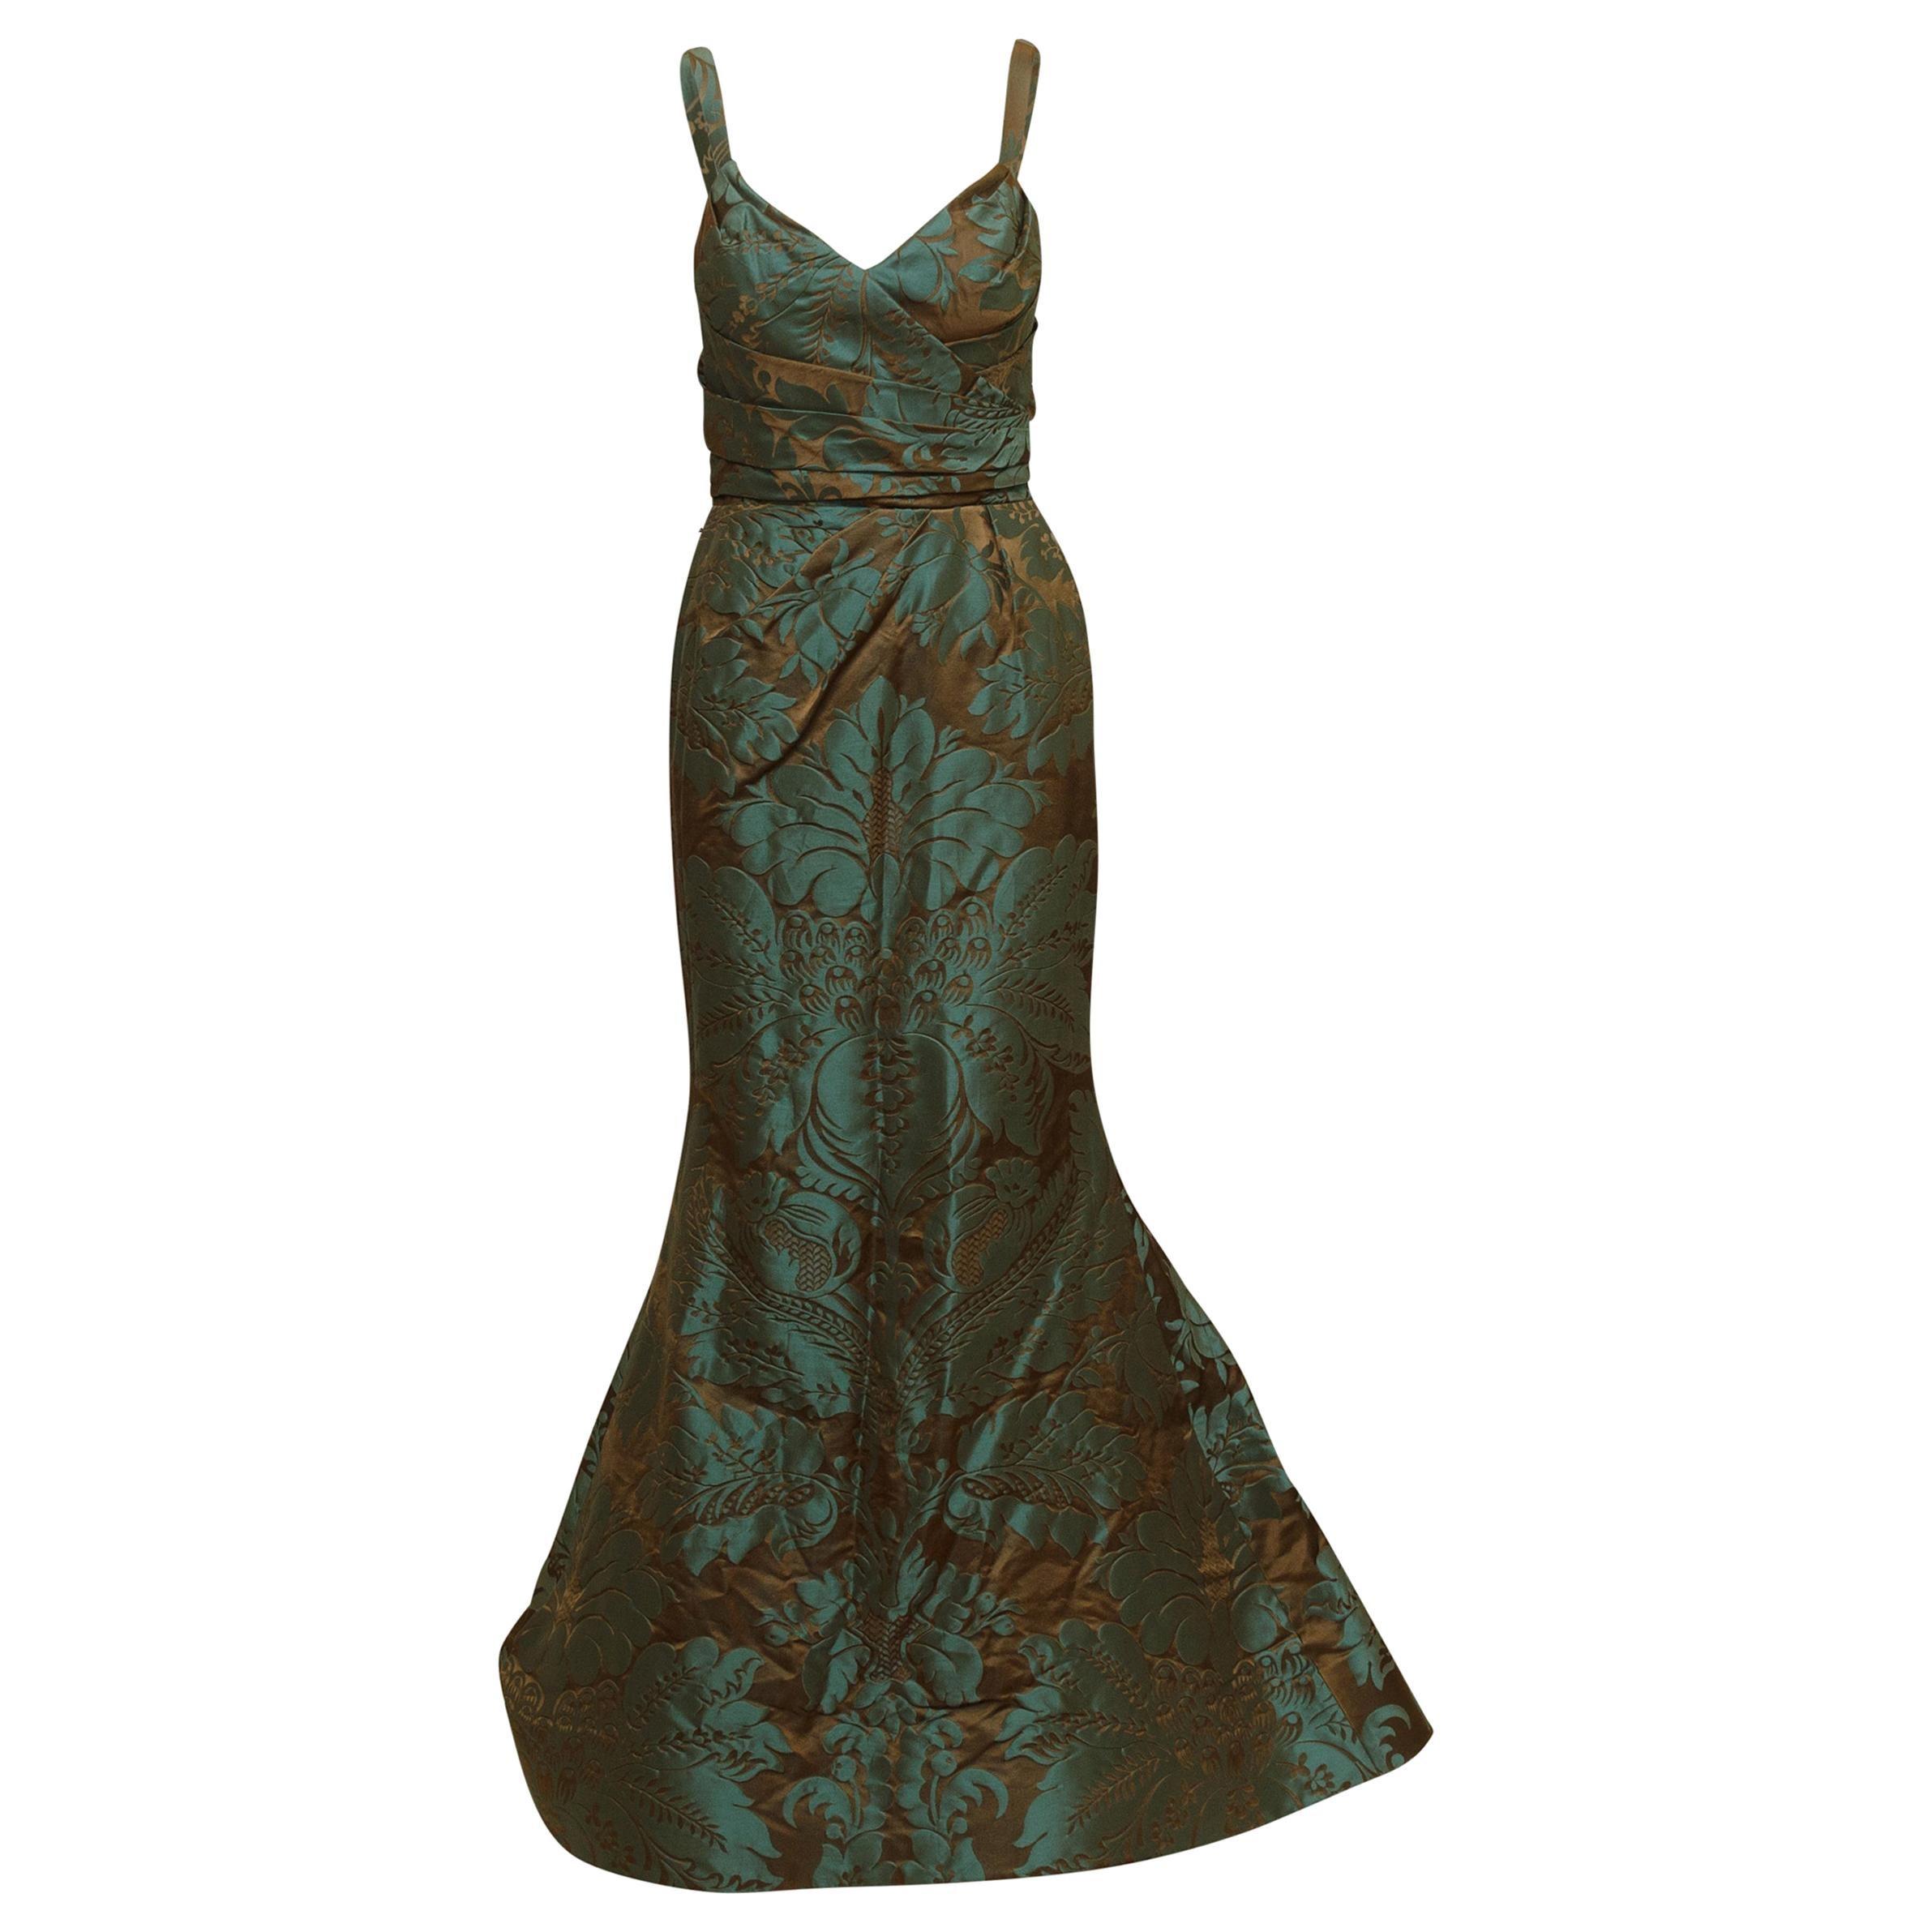 Oscar de la Renta Teal & Brown Fall 2011 Jacquard Gown